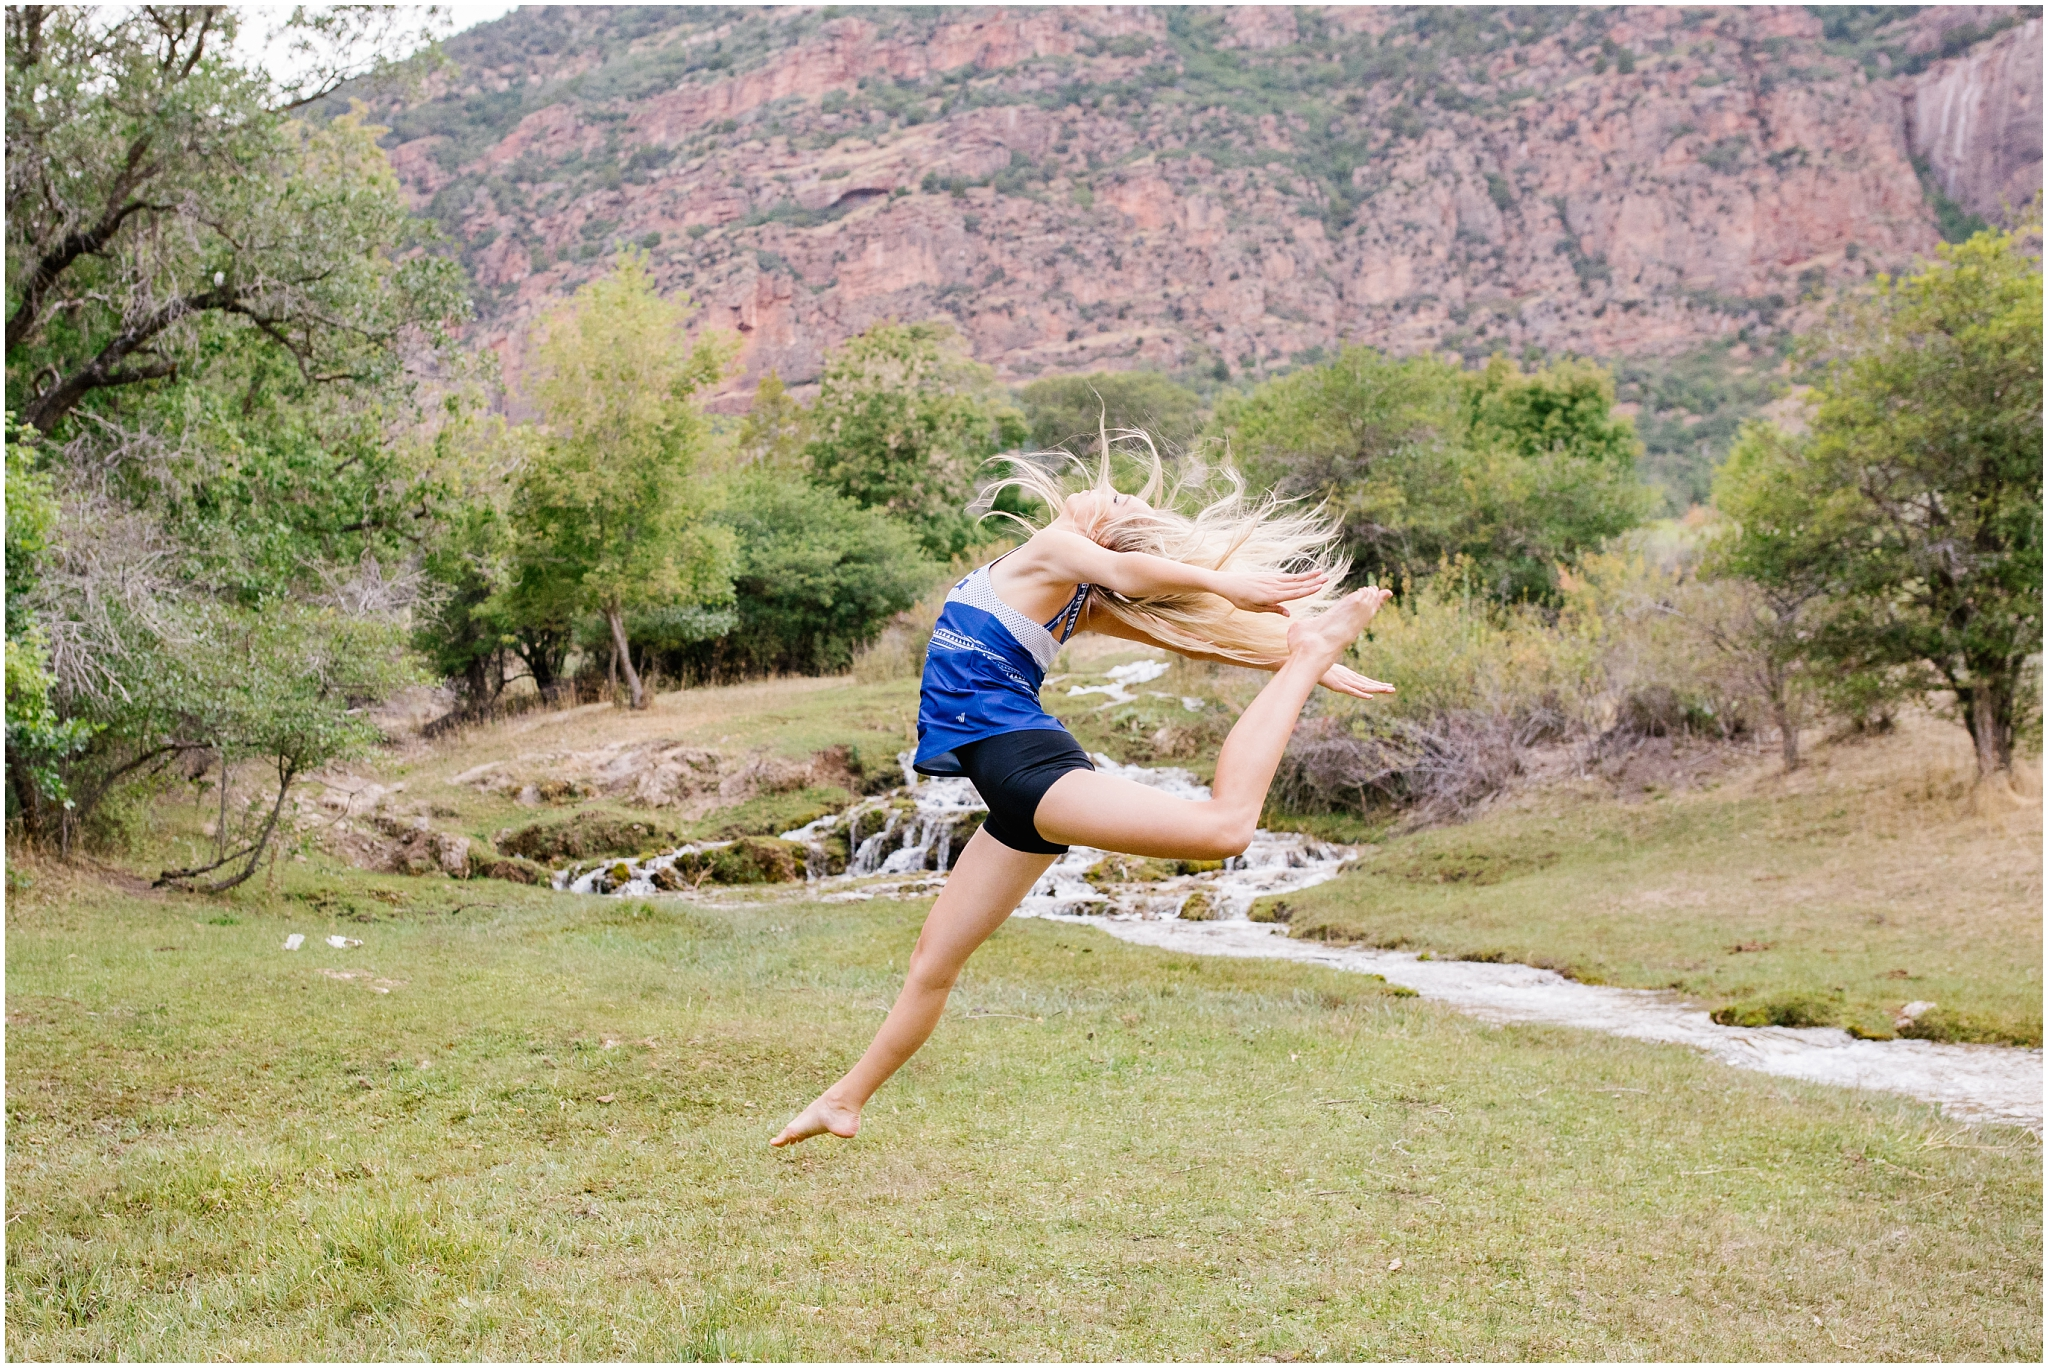 GVHSDRILL-30_Lizzie-B-Imagery-Utah-Family-Photographer-Central-Utah-Park-City-Salt-Lake-City-Drill-Team-Photography-Dance.jpg